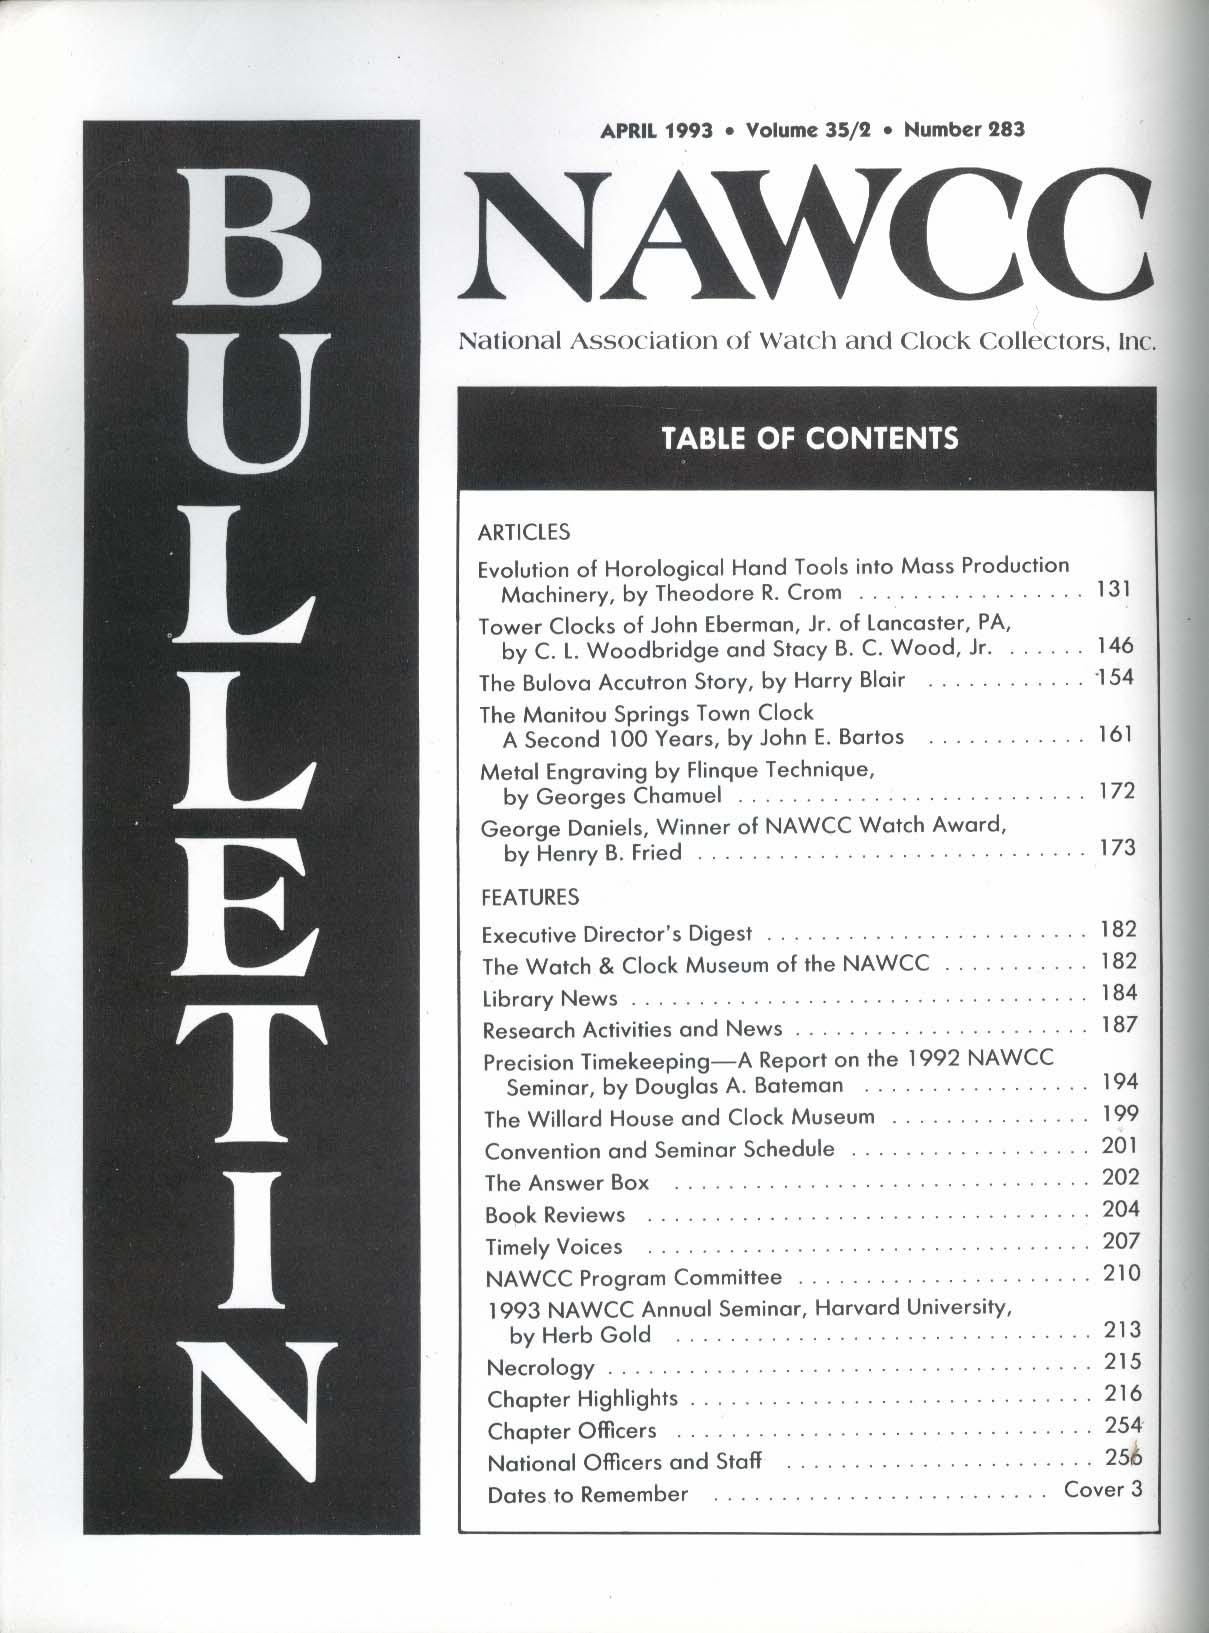 NAWCC Bulletin #283 John Eberman Bulova Accutron Manitou Metal Engraving 4 1993